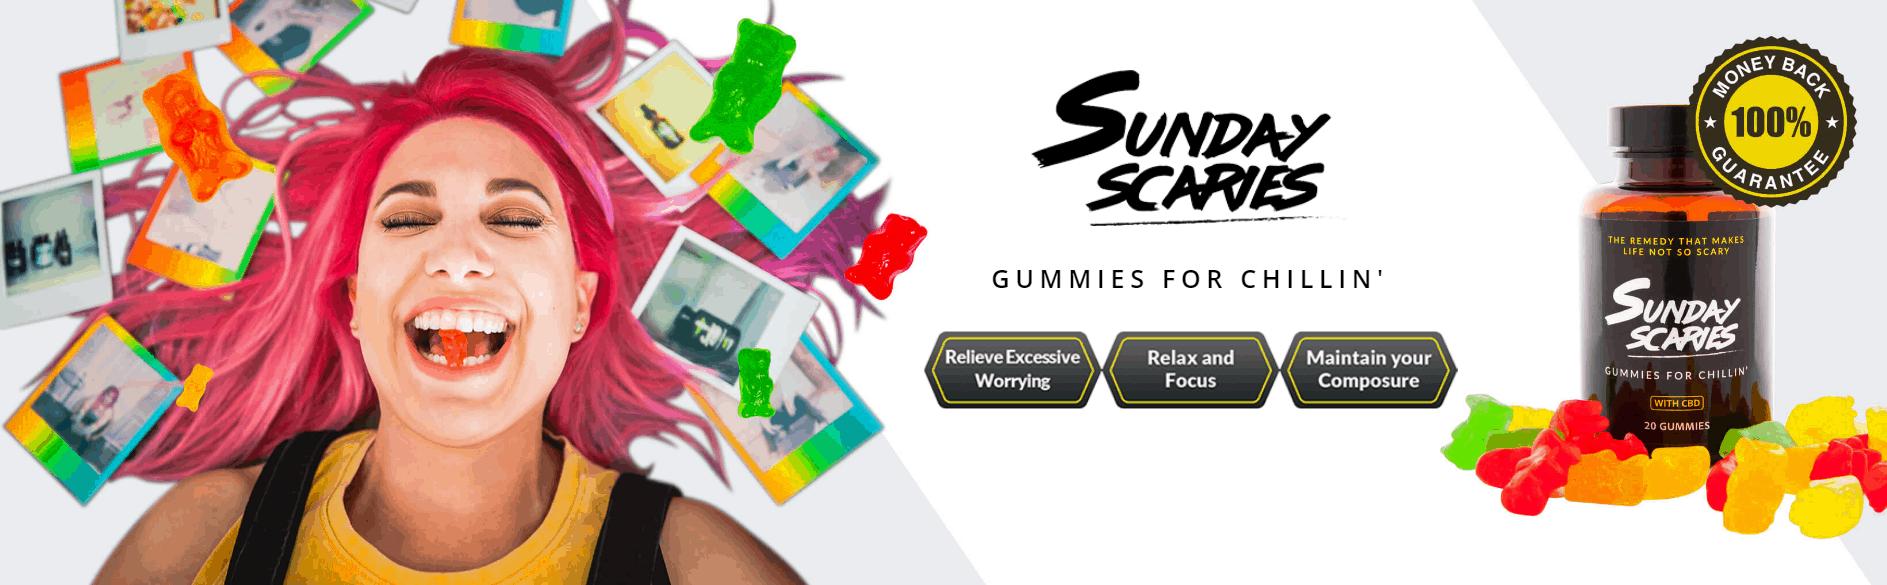 Sunday Scaries CBD Coupons Premium Products